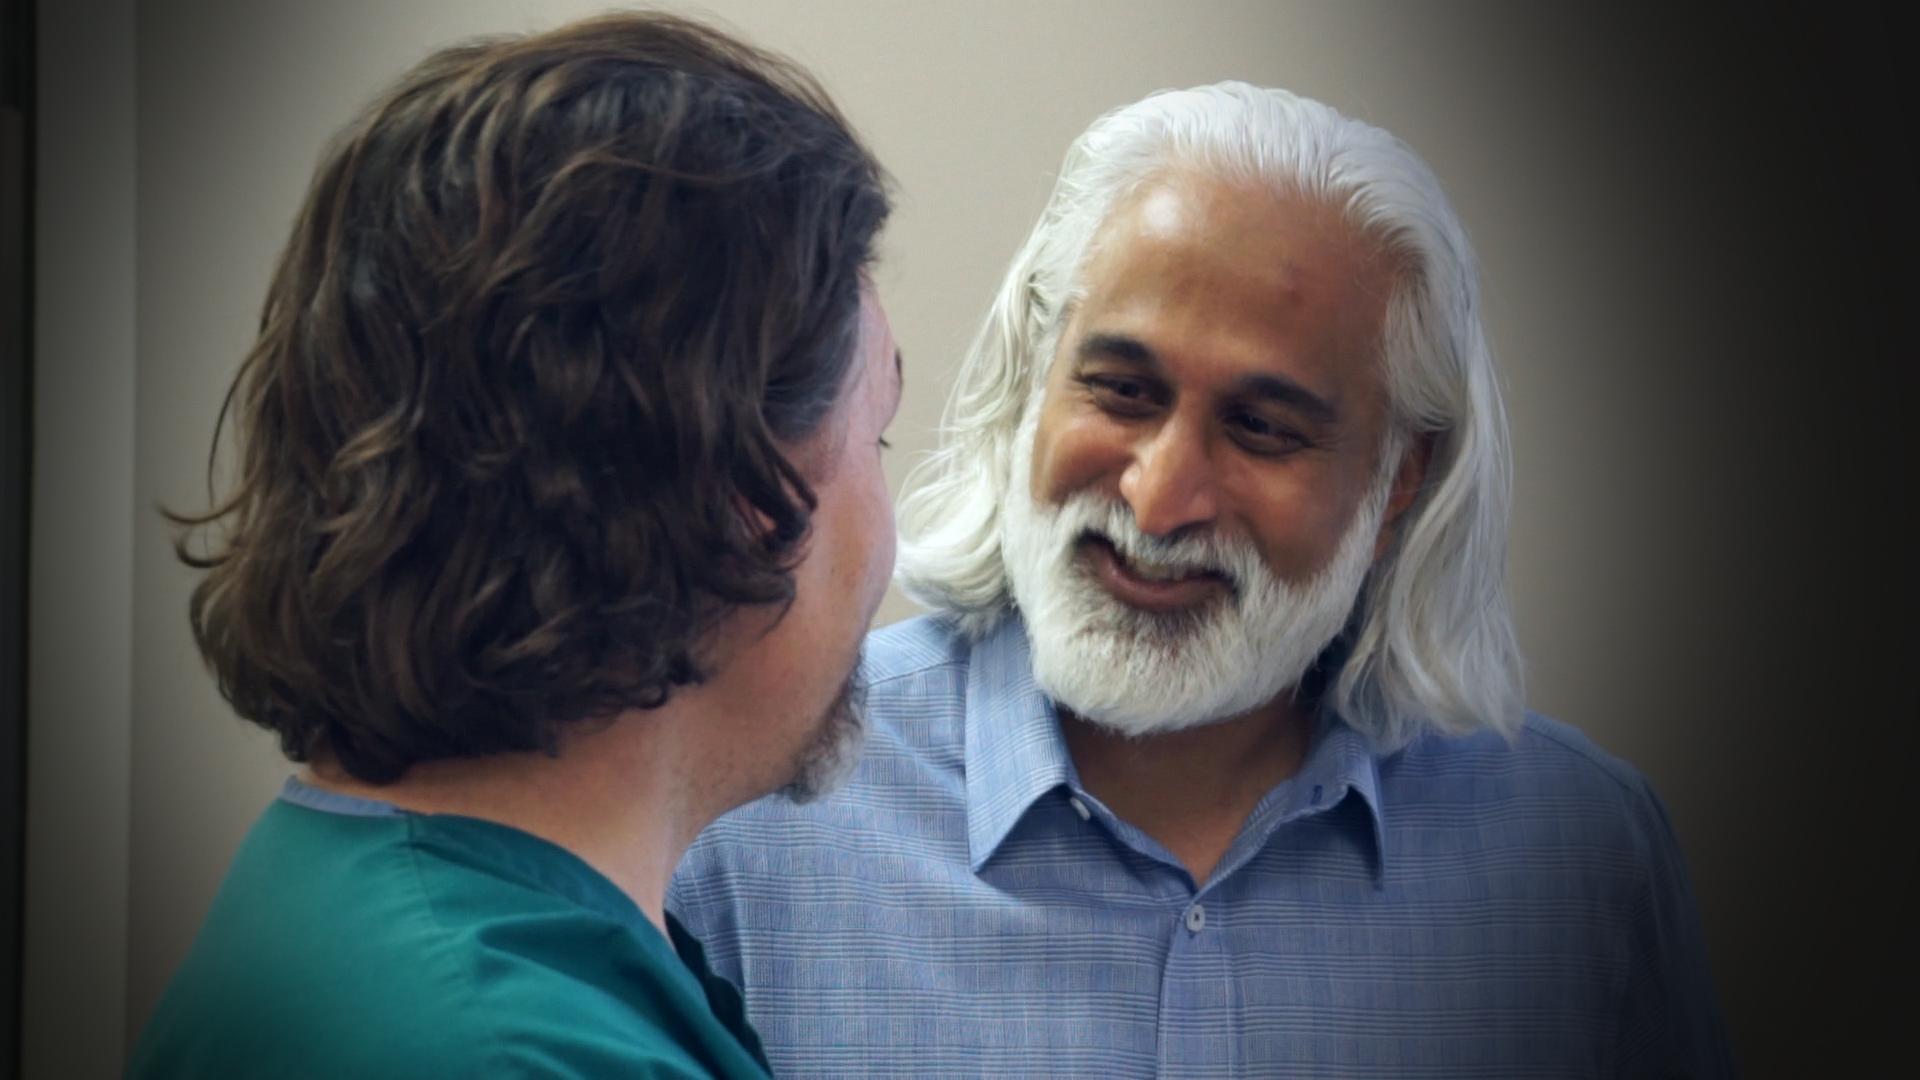 Dr. Chad Brekelbaum and Dr. Nirmal Kilambi of NWA Urology